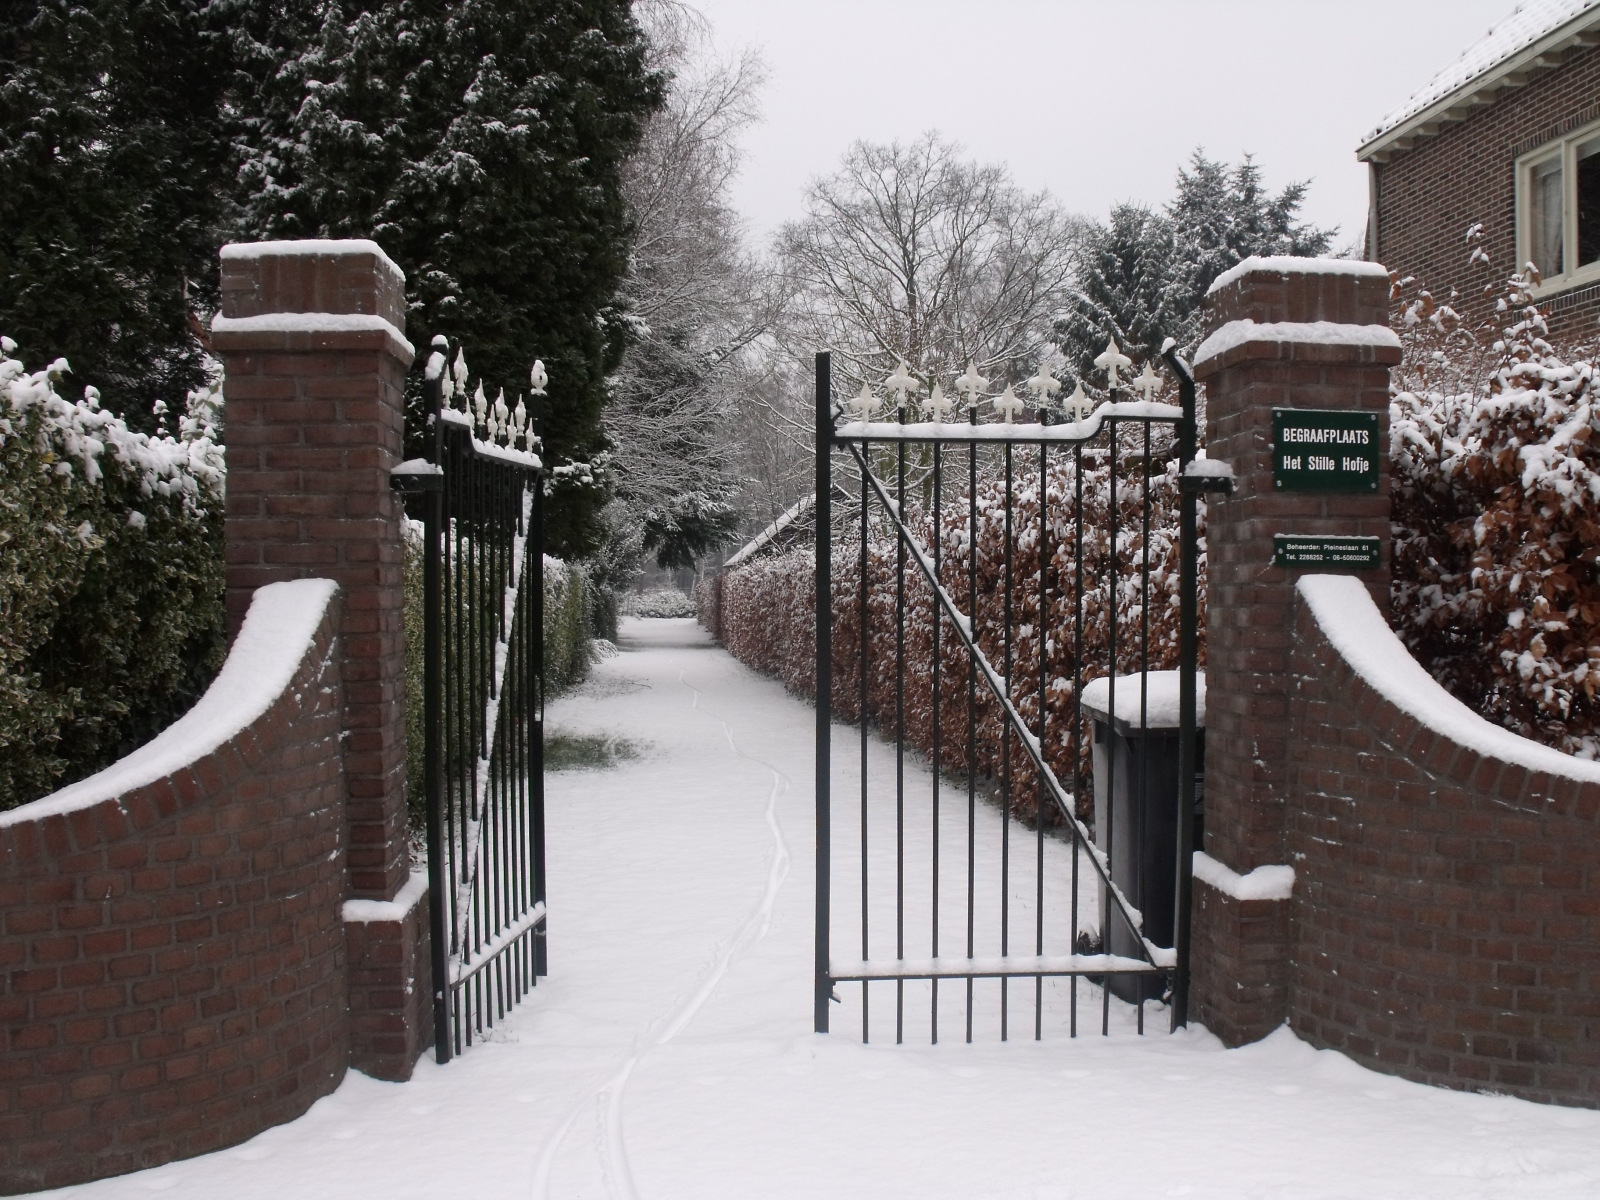 2-toegangshek-in-de-sneeuw-december-2009